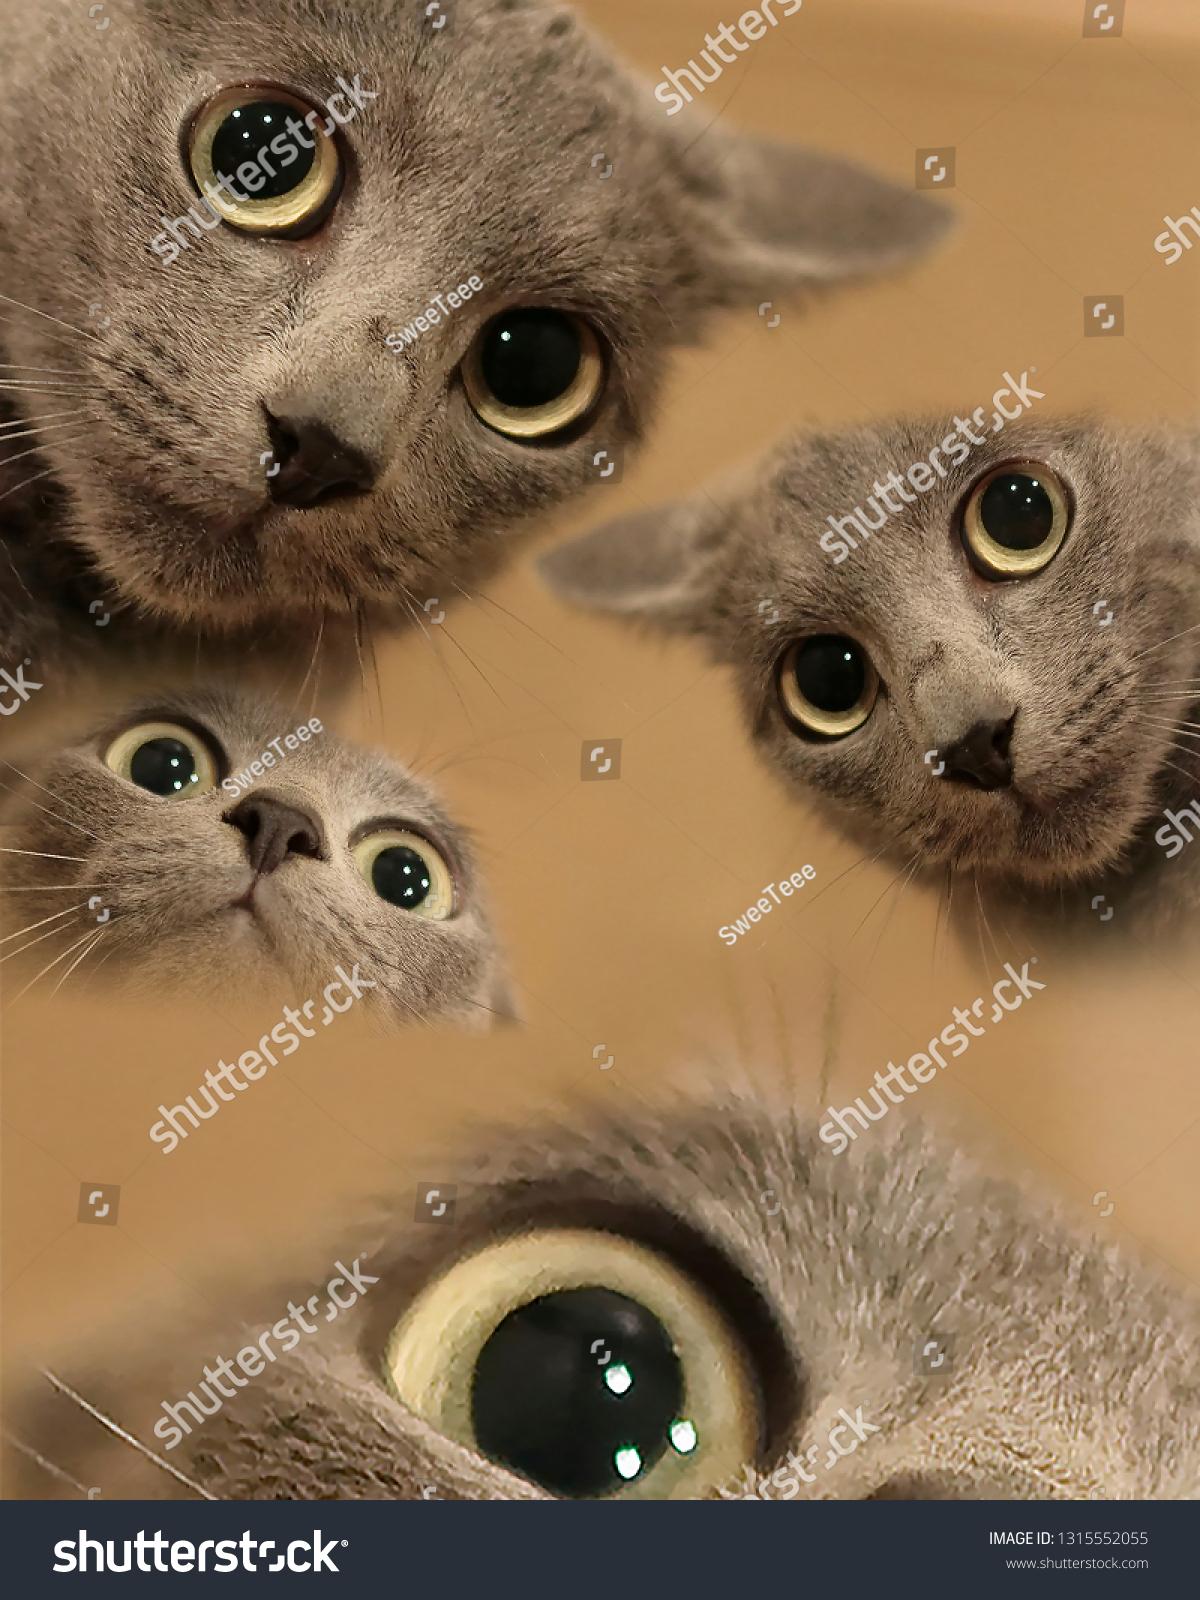 Funny Cat Meme Miscellaneous Stock Image 1315552055